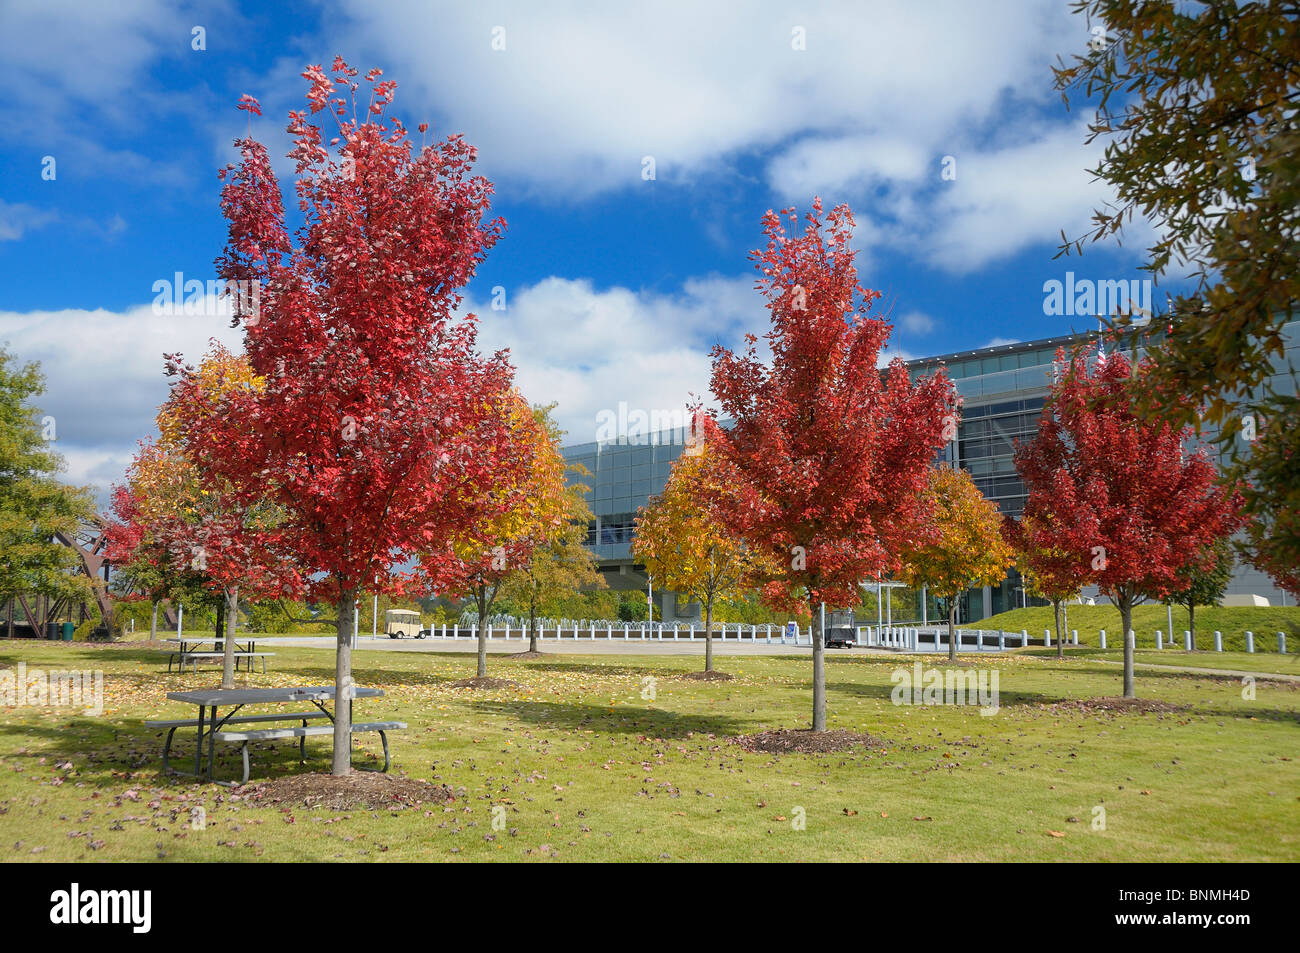 William J. Clinton Presidential Center & Park Library Exterior Little Rock Arkansas USA landscape architecture - Stock Image